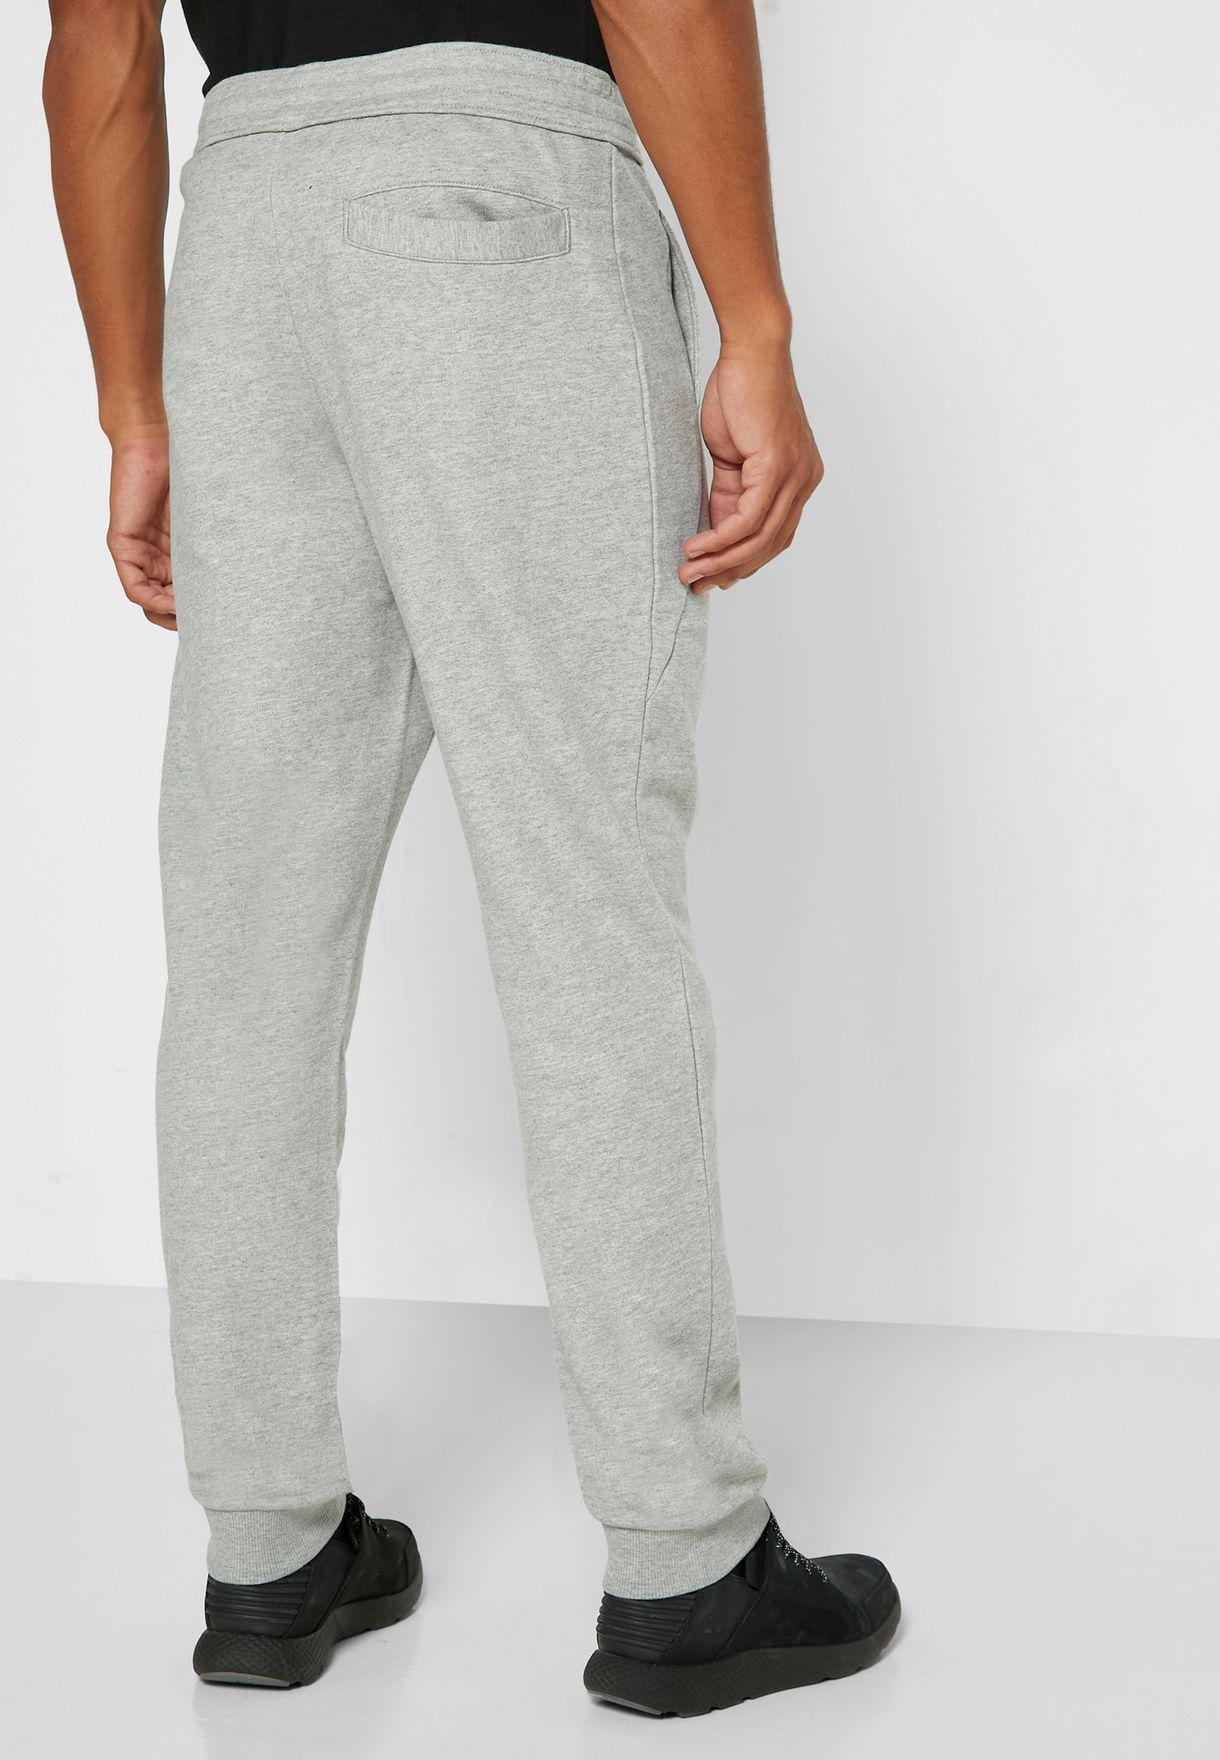 TFO YC Sweatpants